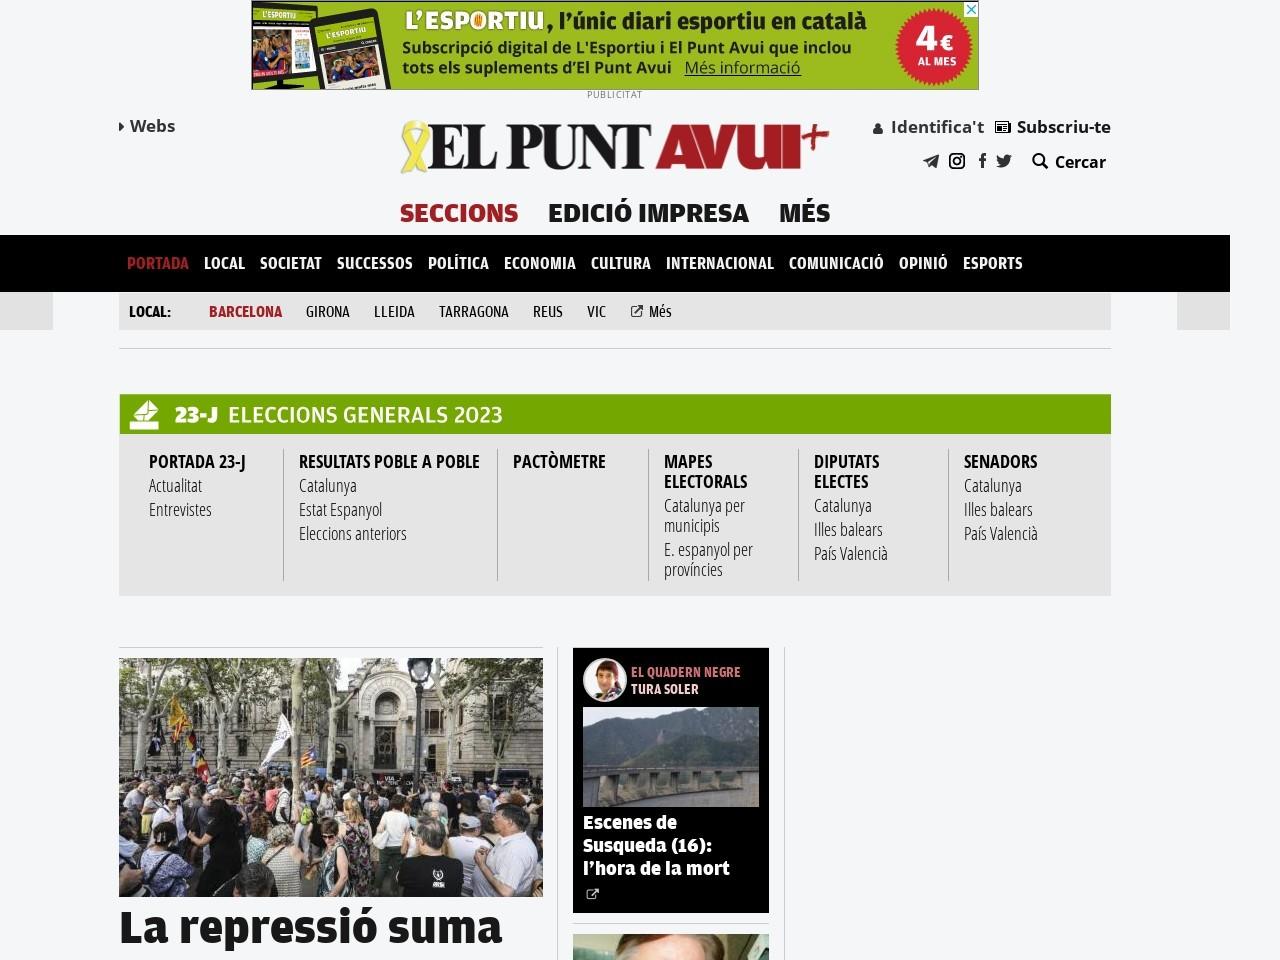 elpunt.com